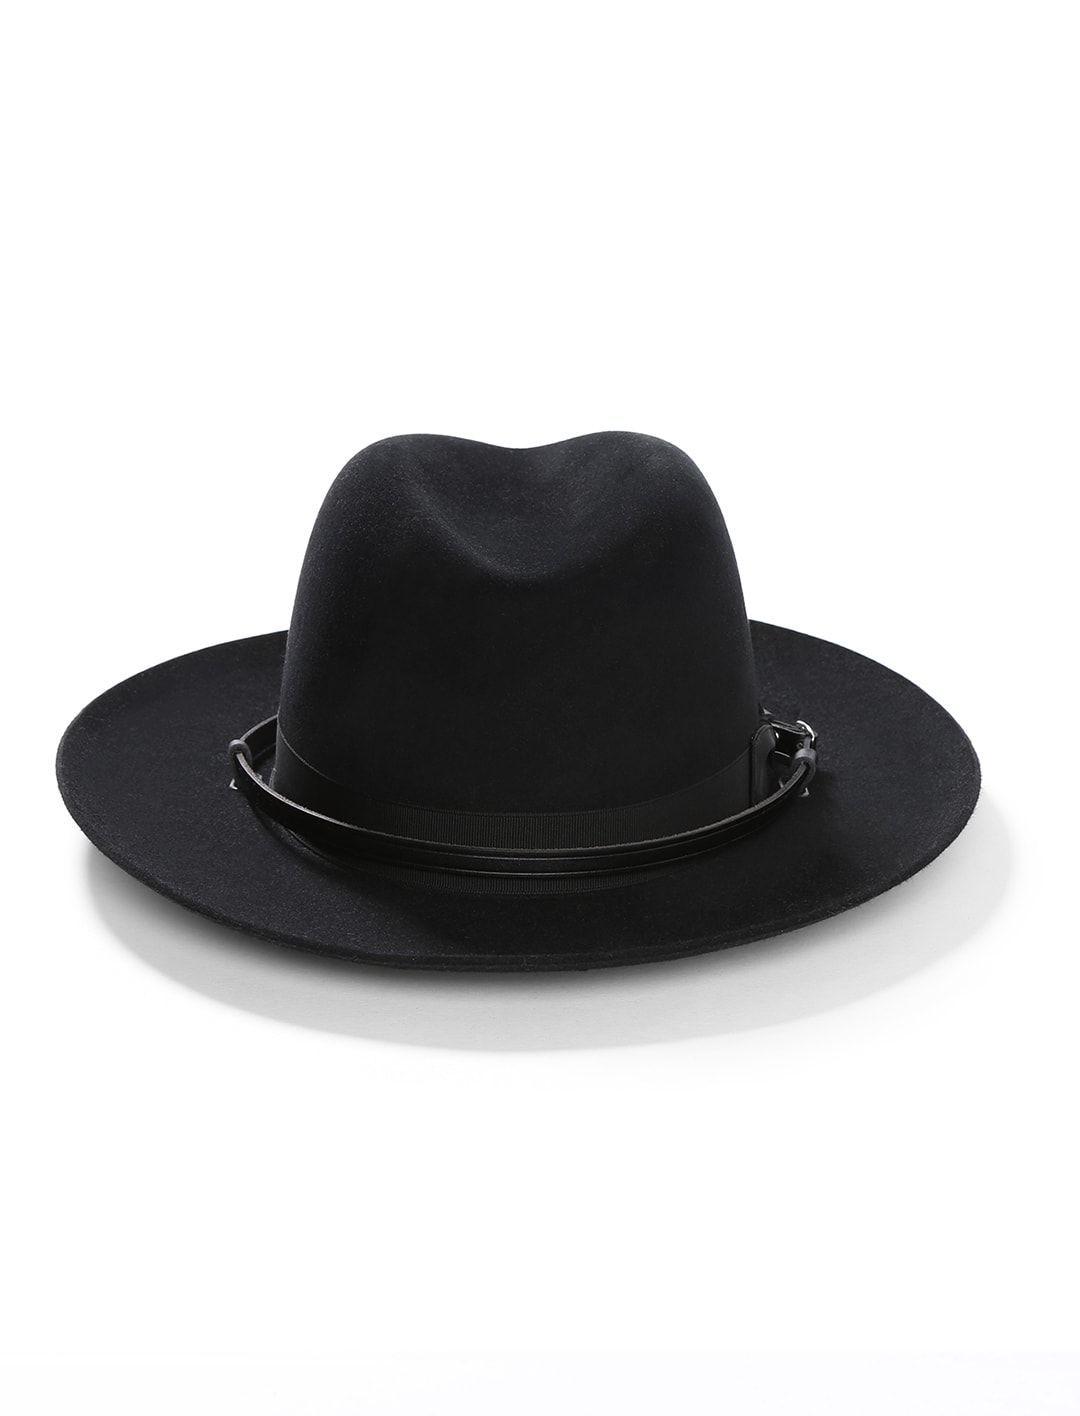 Stetson Mens Cavalry 5x Fur Felt Hat Sfcvly 3230